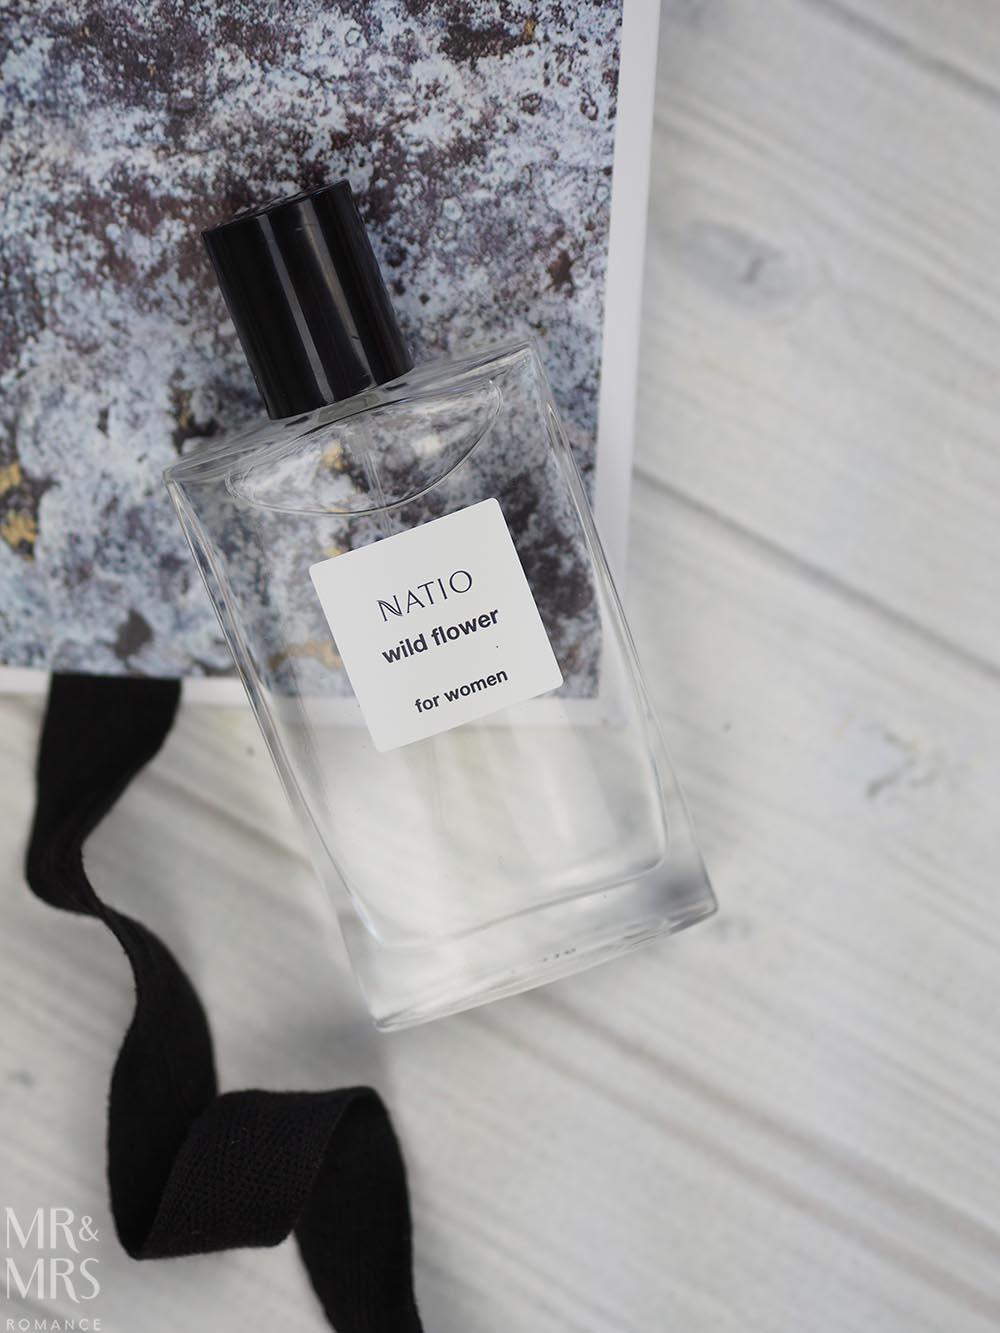 Natio gift sets - Cosmetics gift ideas